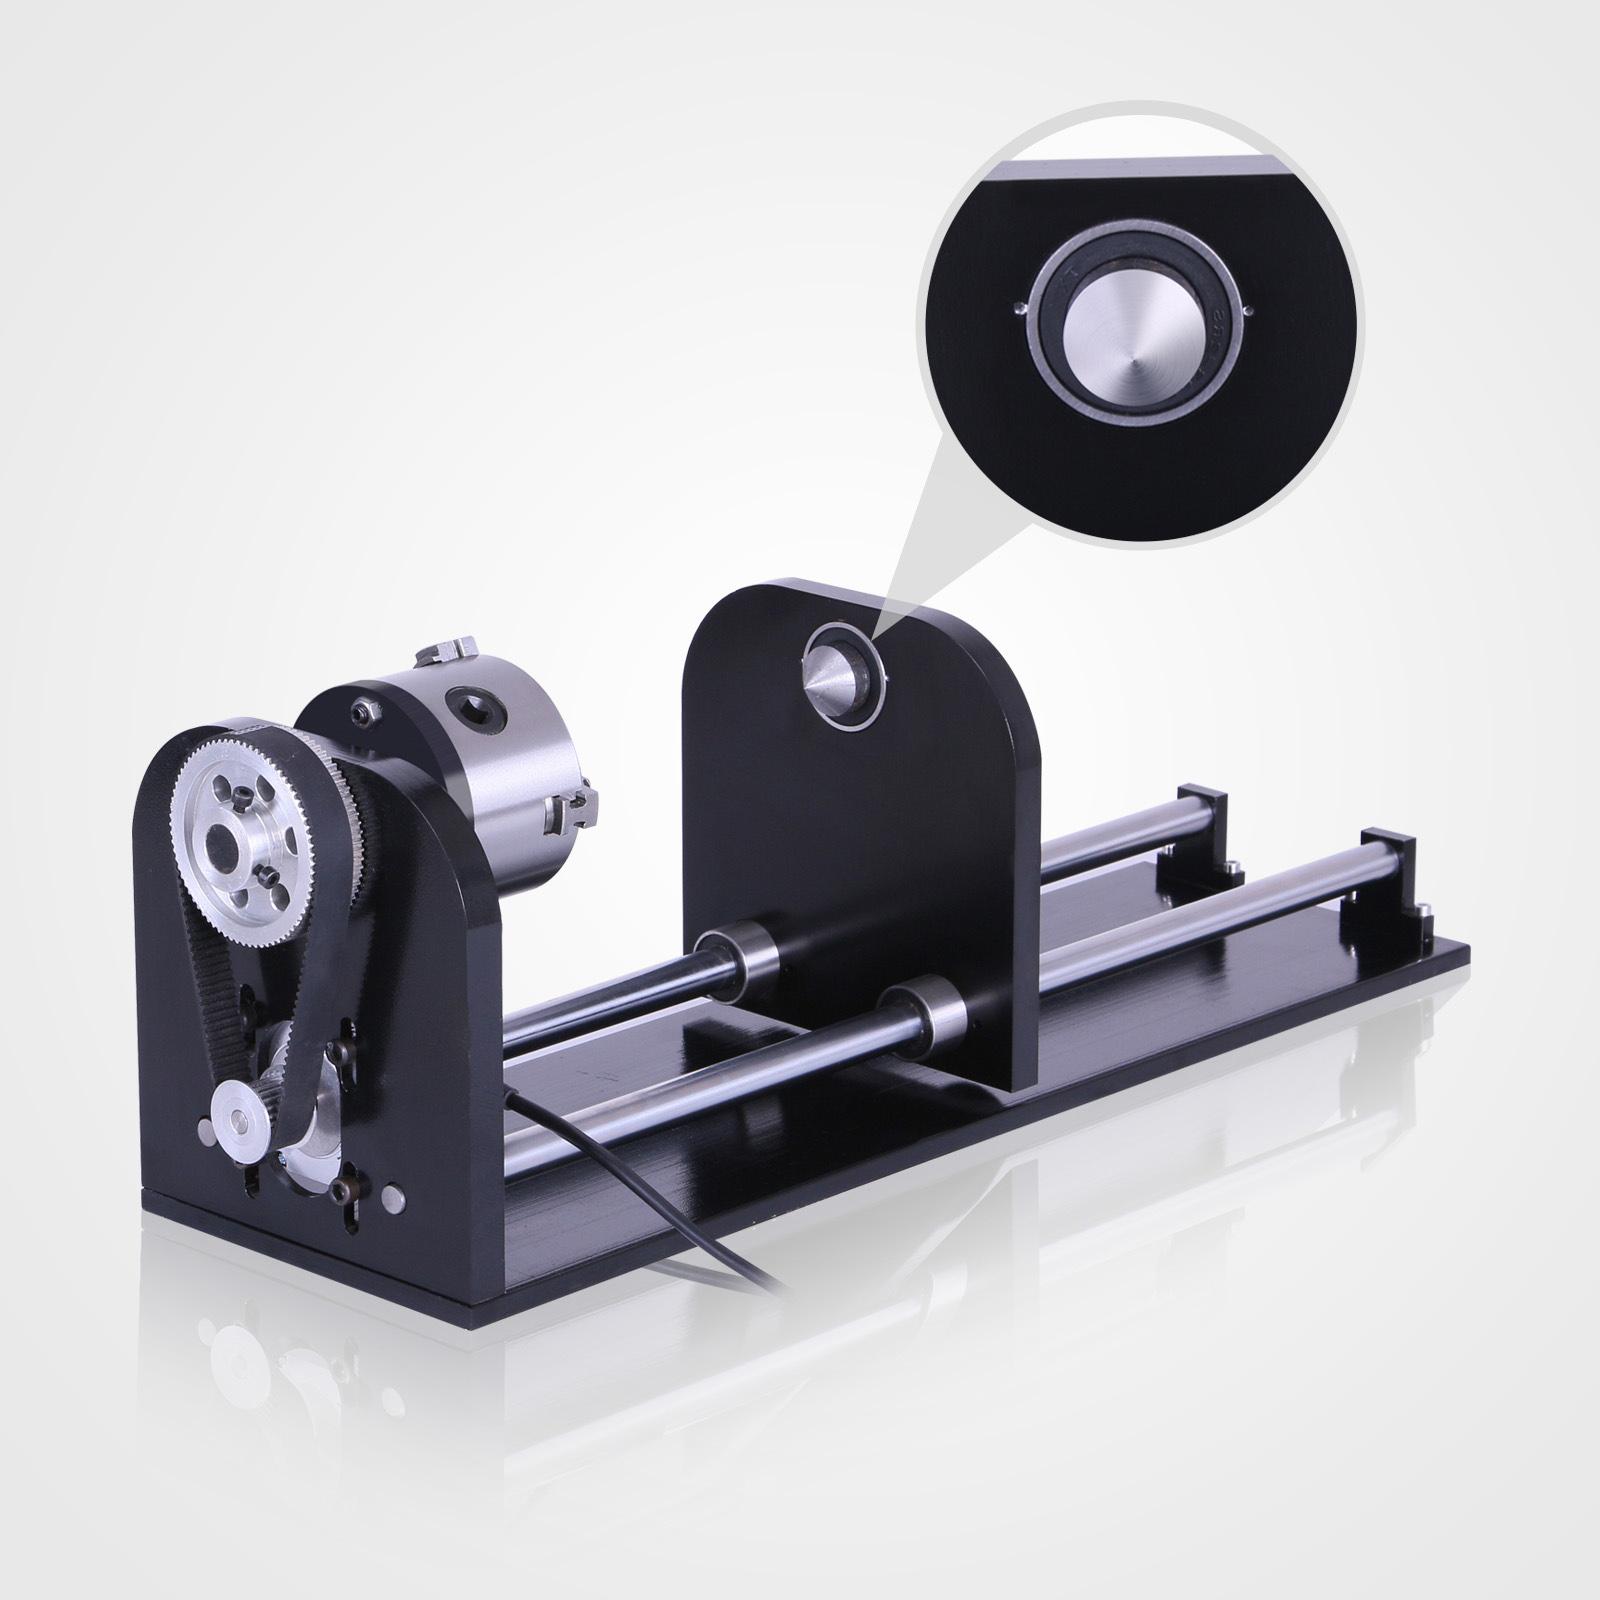 Macchina-per-Incisione-Laser-CO2-40-130W-Asse-Rotante-Tagliatrice-Incisore miniatura 86